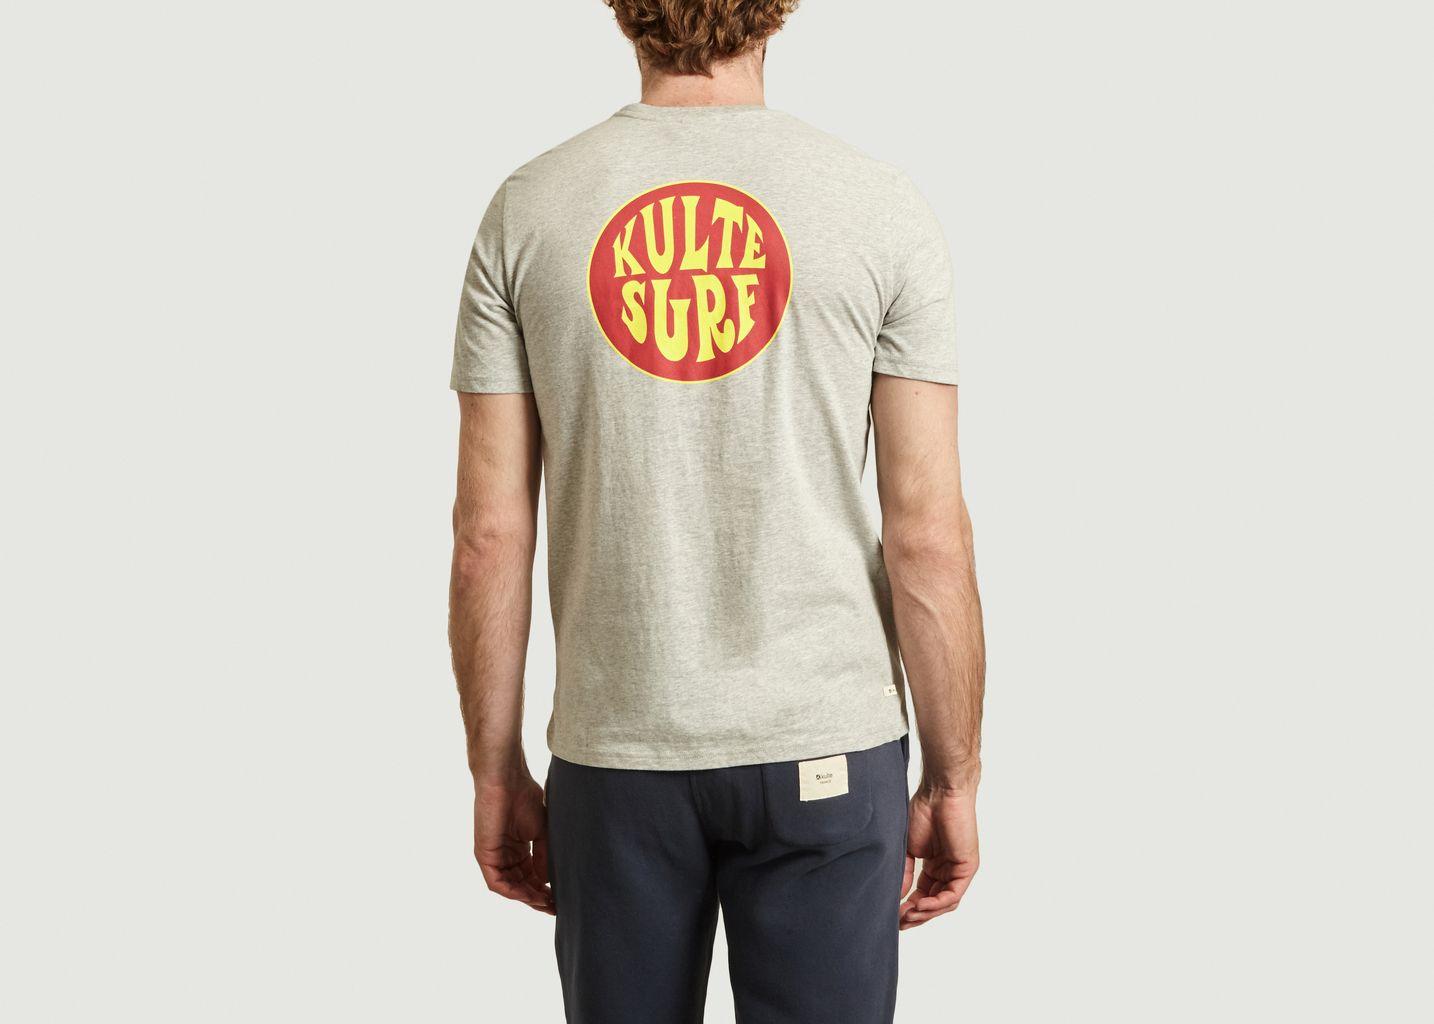 T-shirt Kulte Surf - Kulte